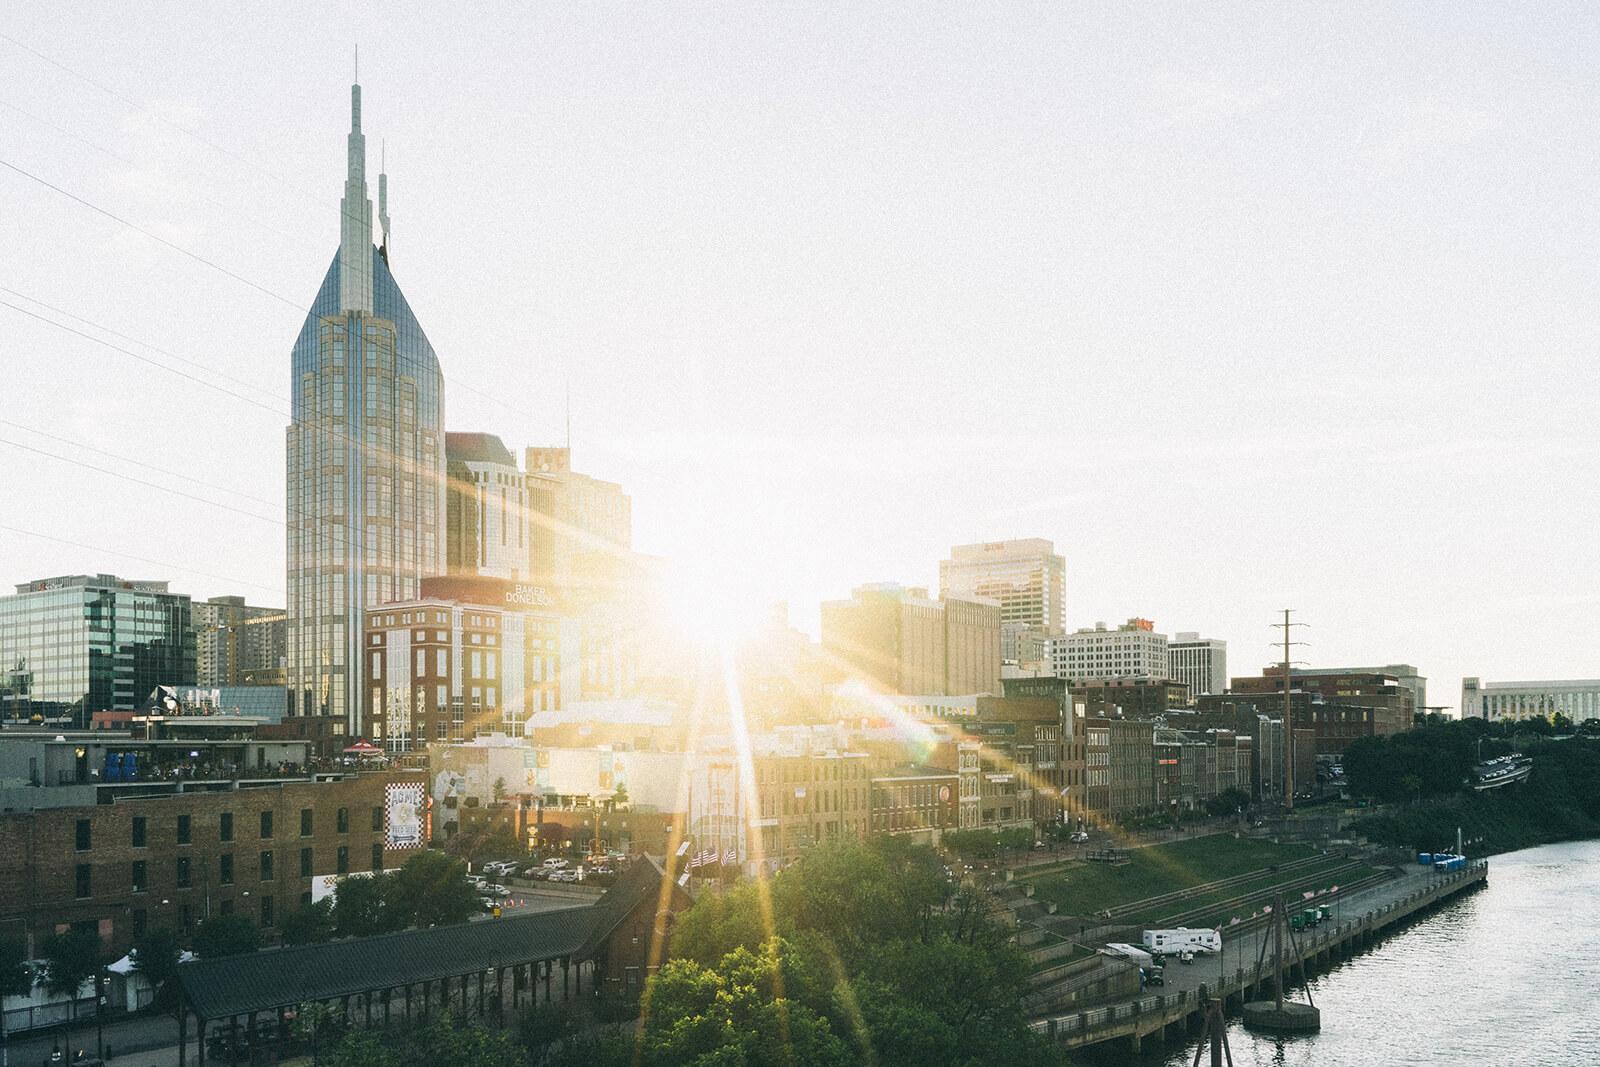 Sunrise in Nashville, Tennessee